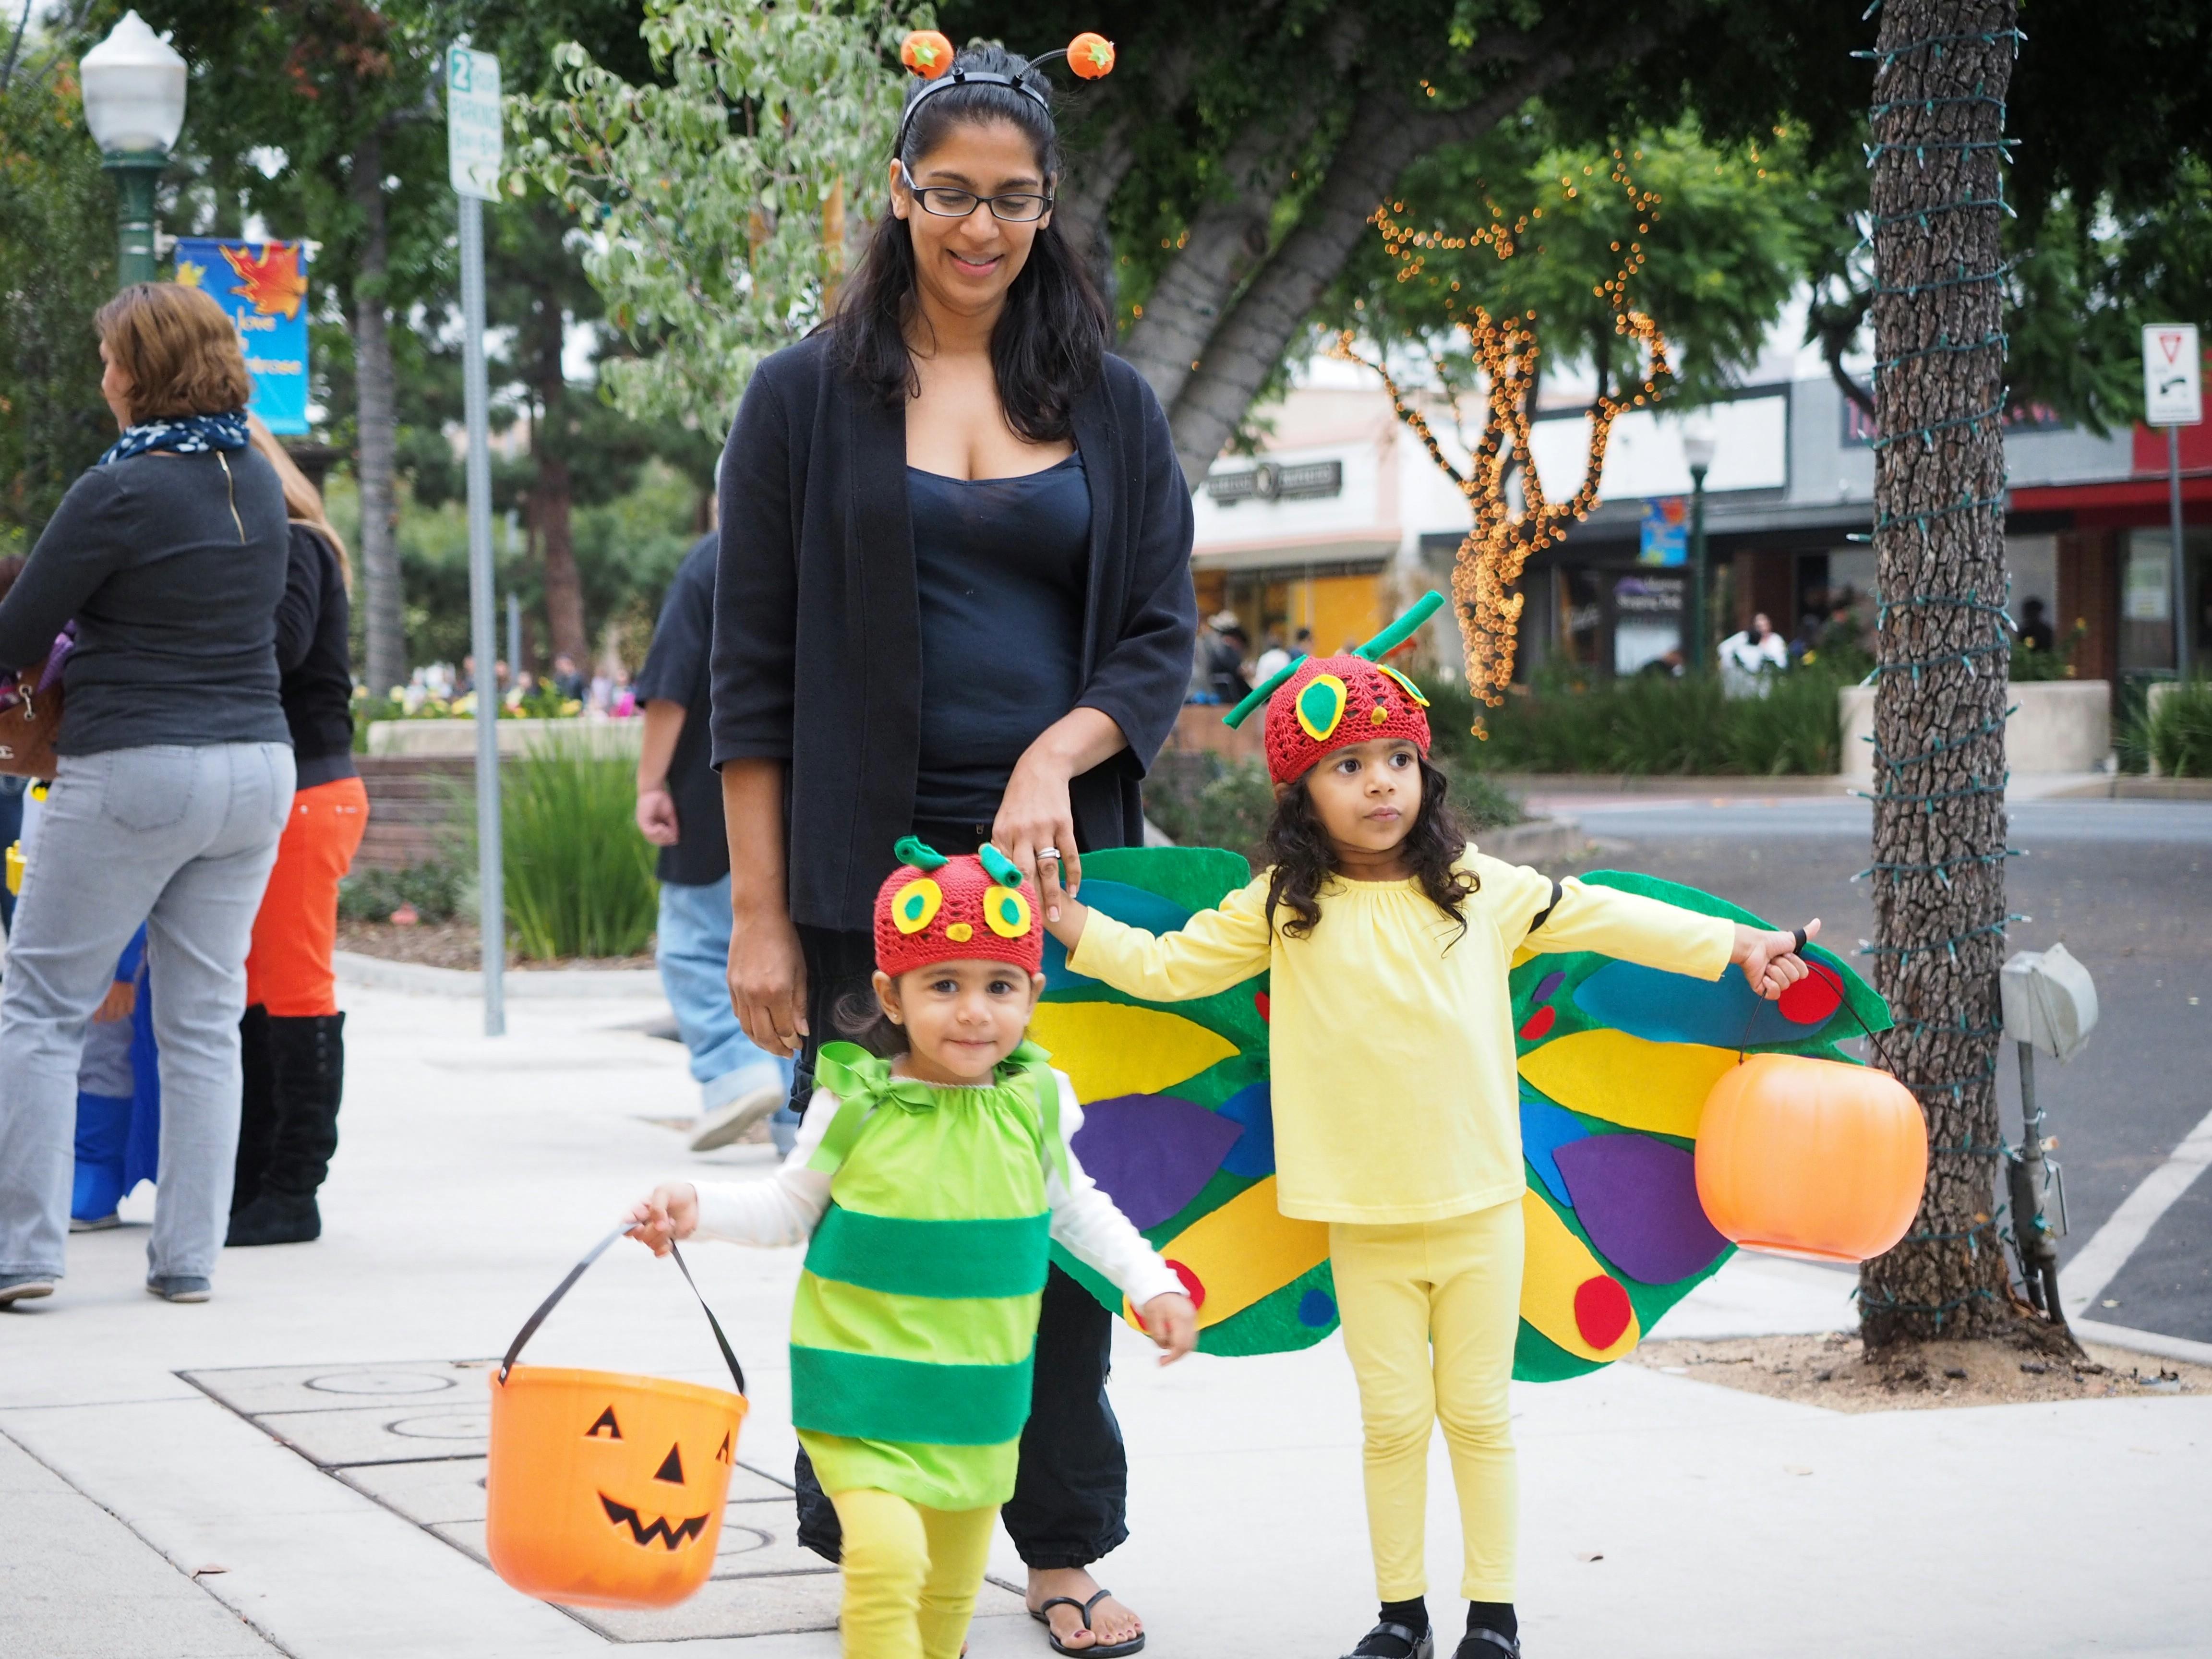 Diy very hungry caterpillar costume and beautiful butterfly costume olympus digital camera solutioingenieria Gallery